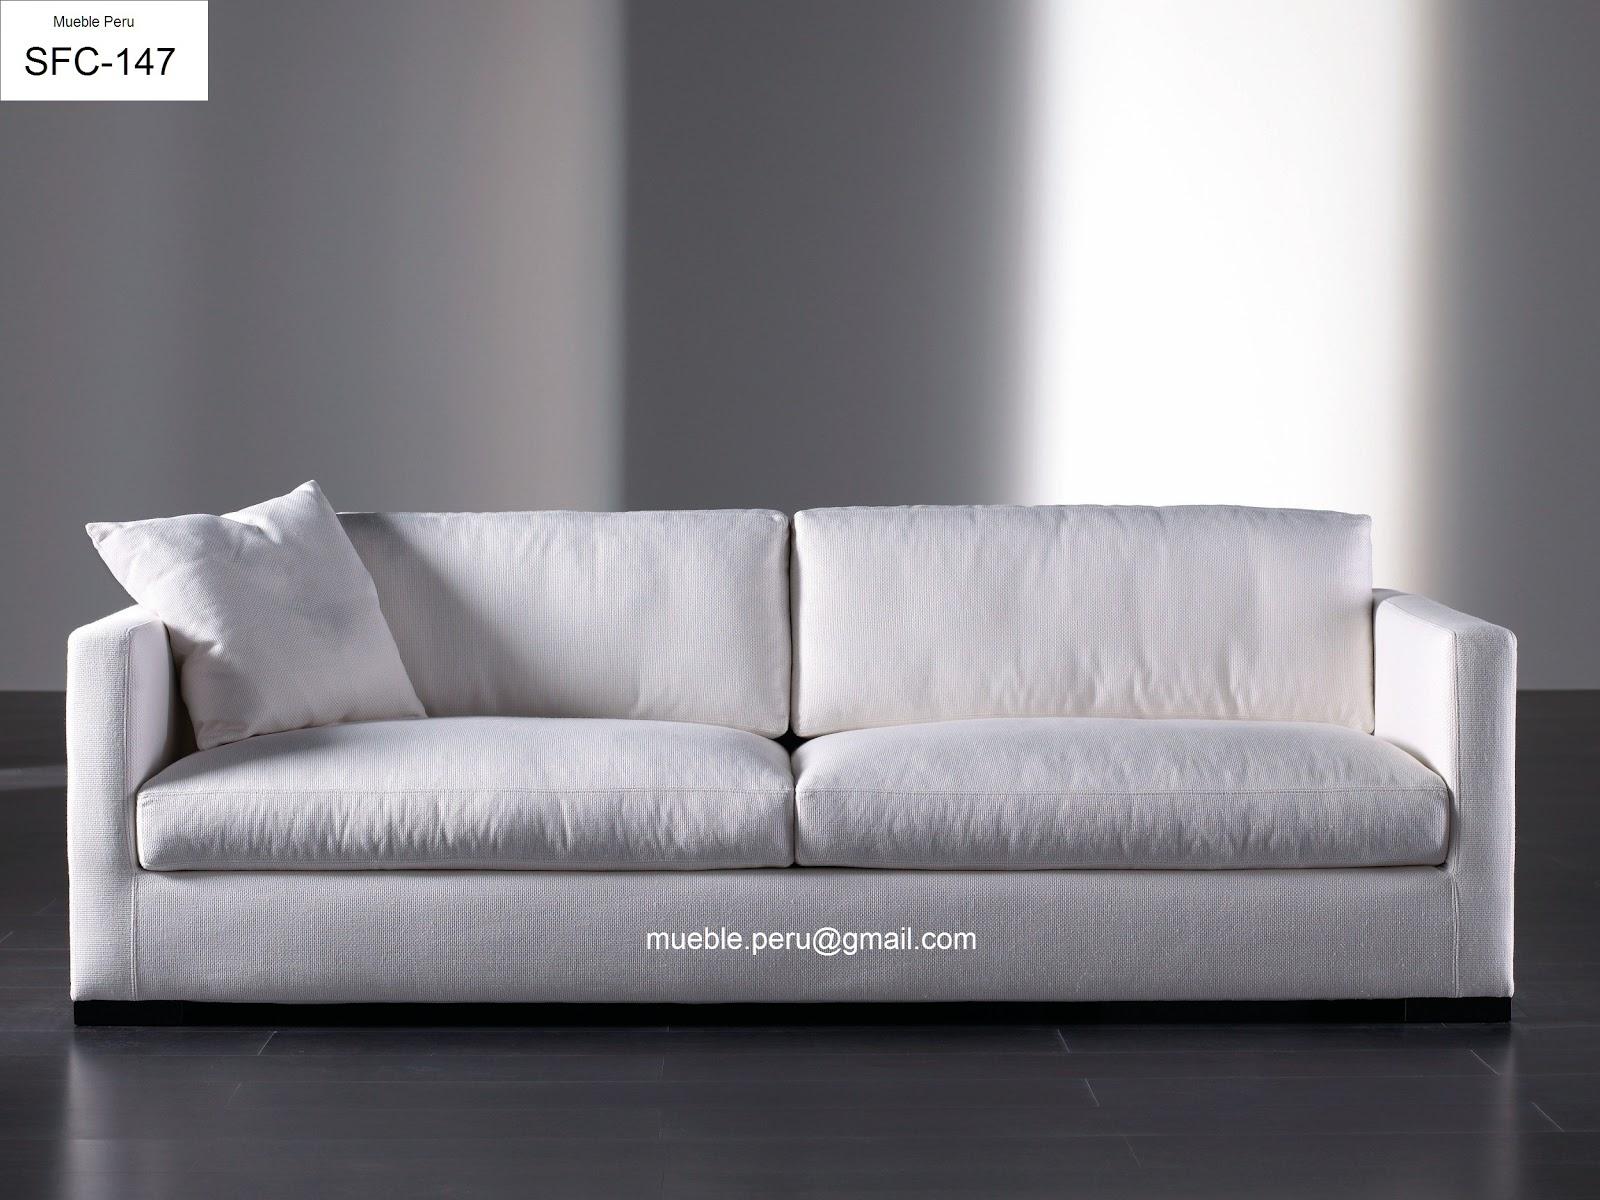 Mueble per muebles de sala sofas cama con entrega a for Salas con sofa cama